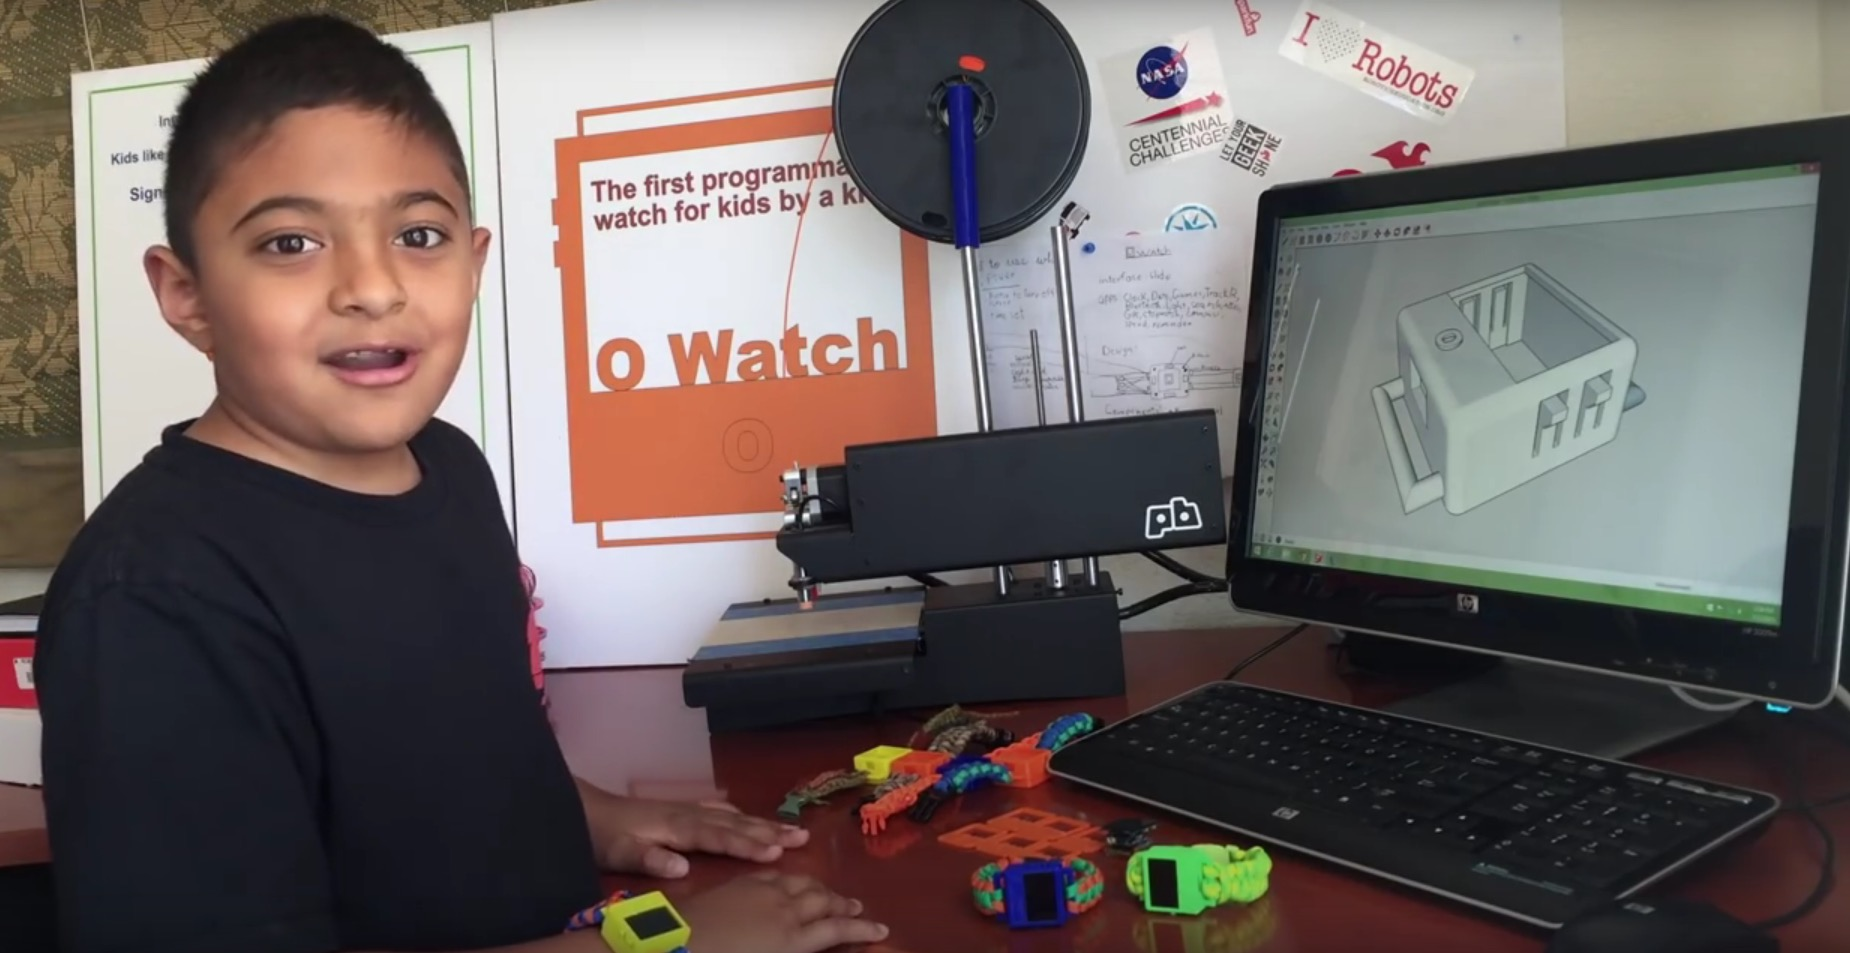 〔 3D打印 〕8歲小朋友印智能錶  |裝app測溫樣樣皆能